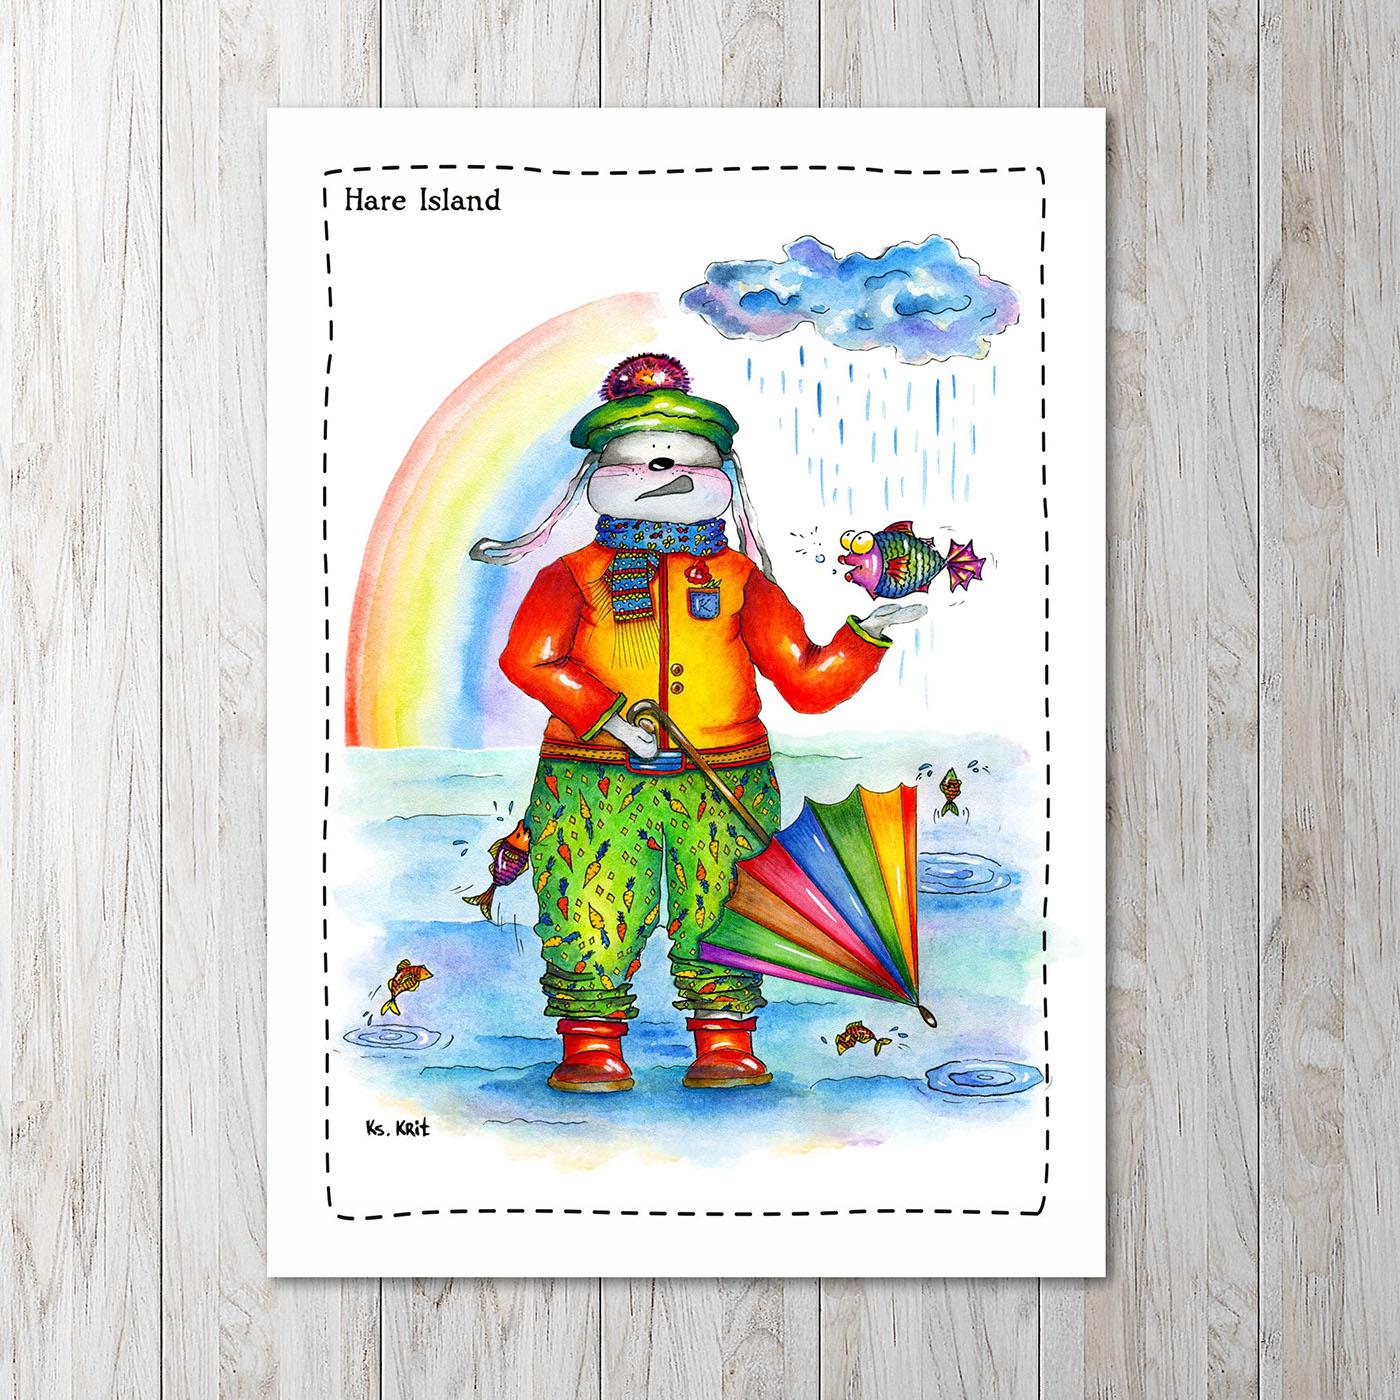 Funny rabbit / рисунки Ксения Крит